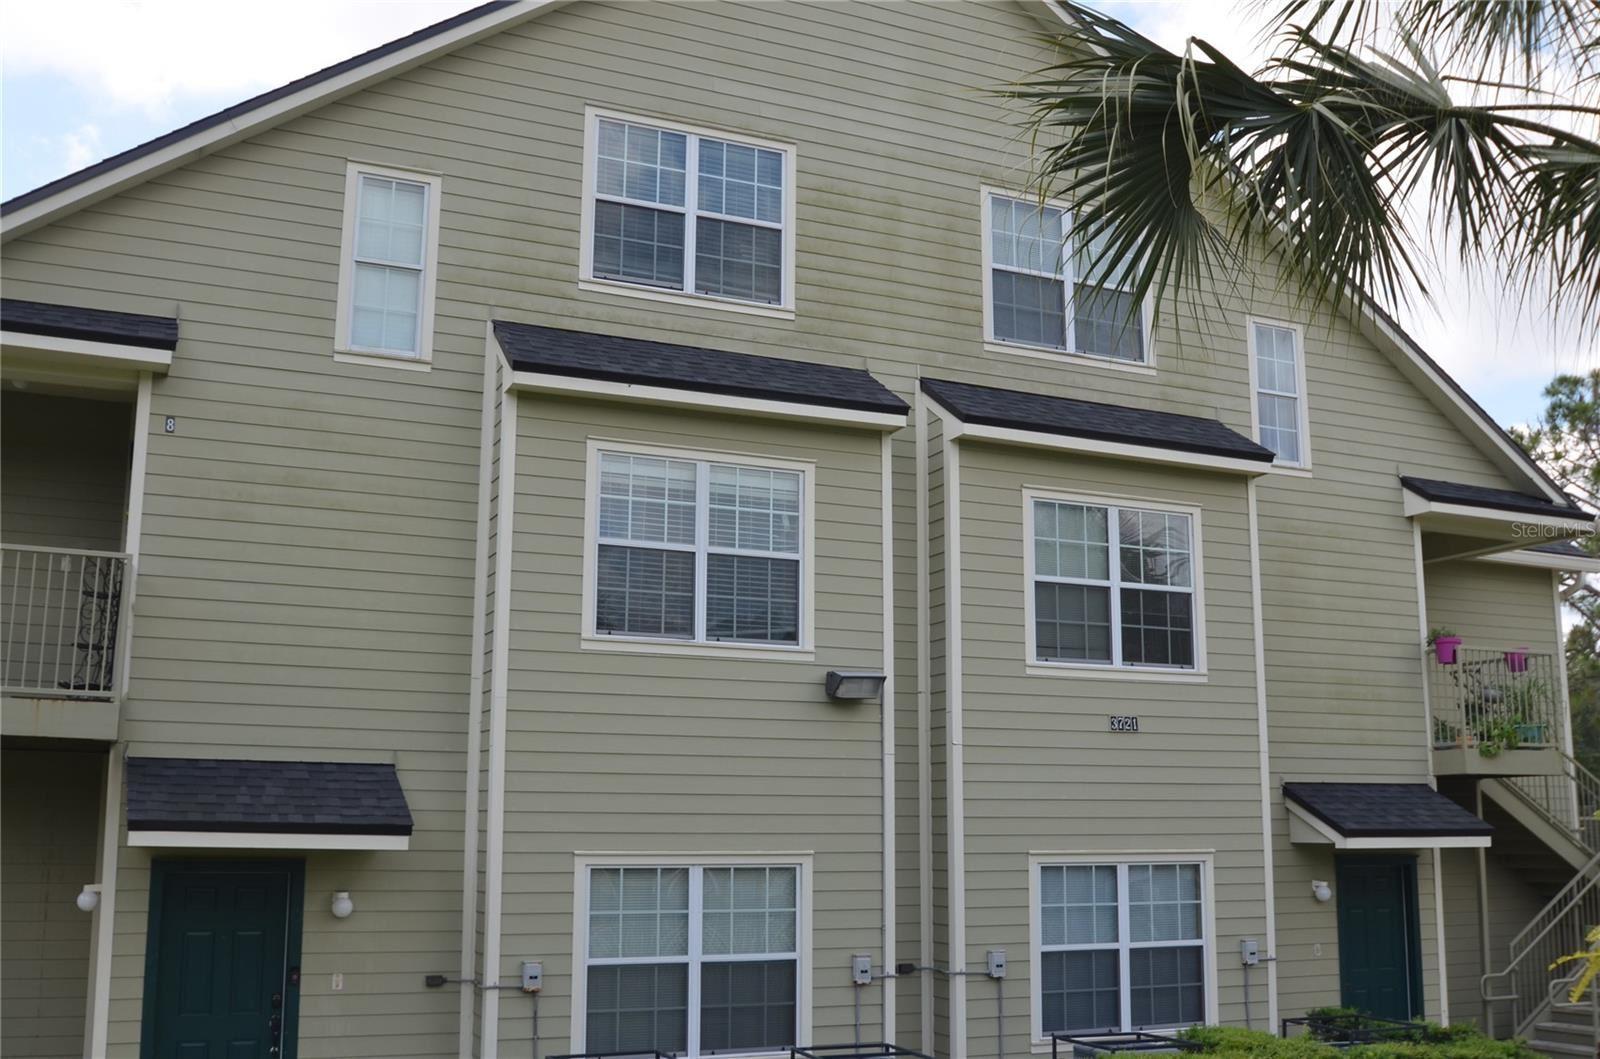 3721 S LAKE ORLANDO PARKWAY #03, Orlando, FL 32808 - #: O5962048